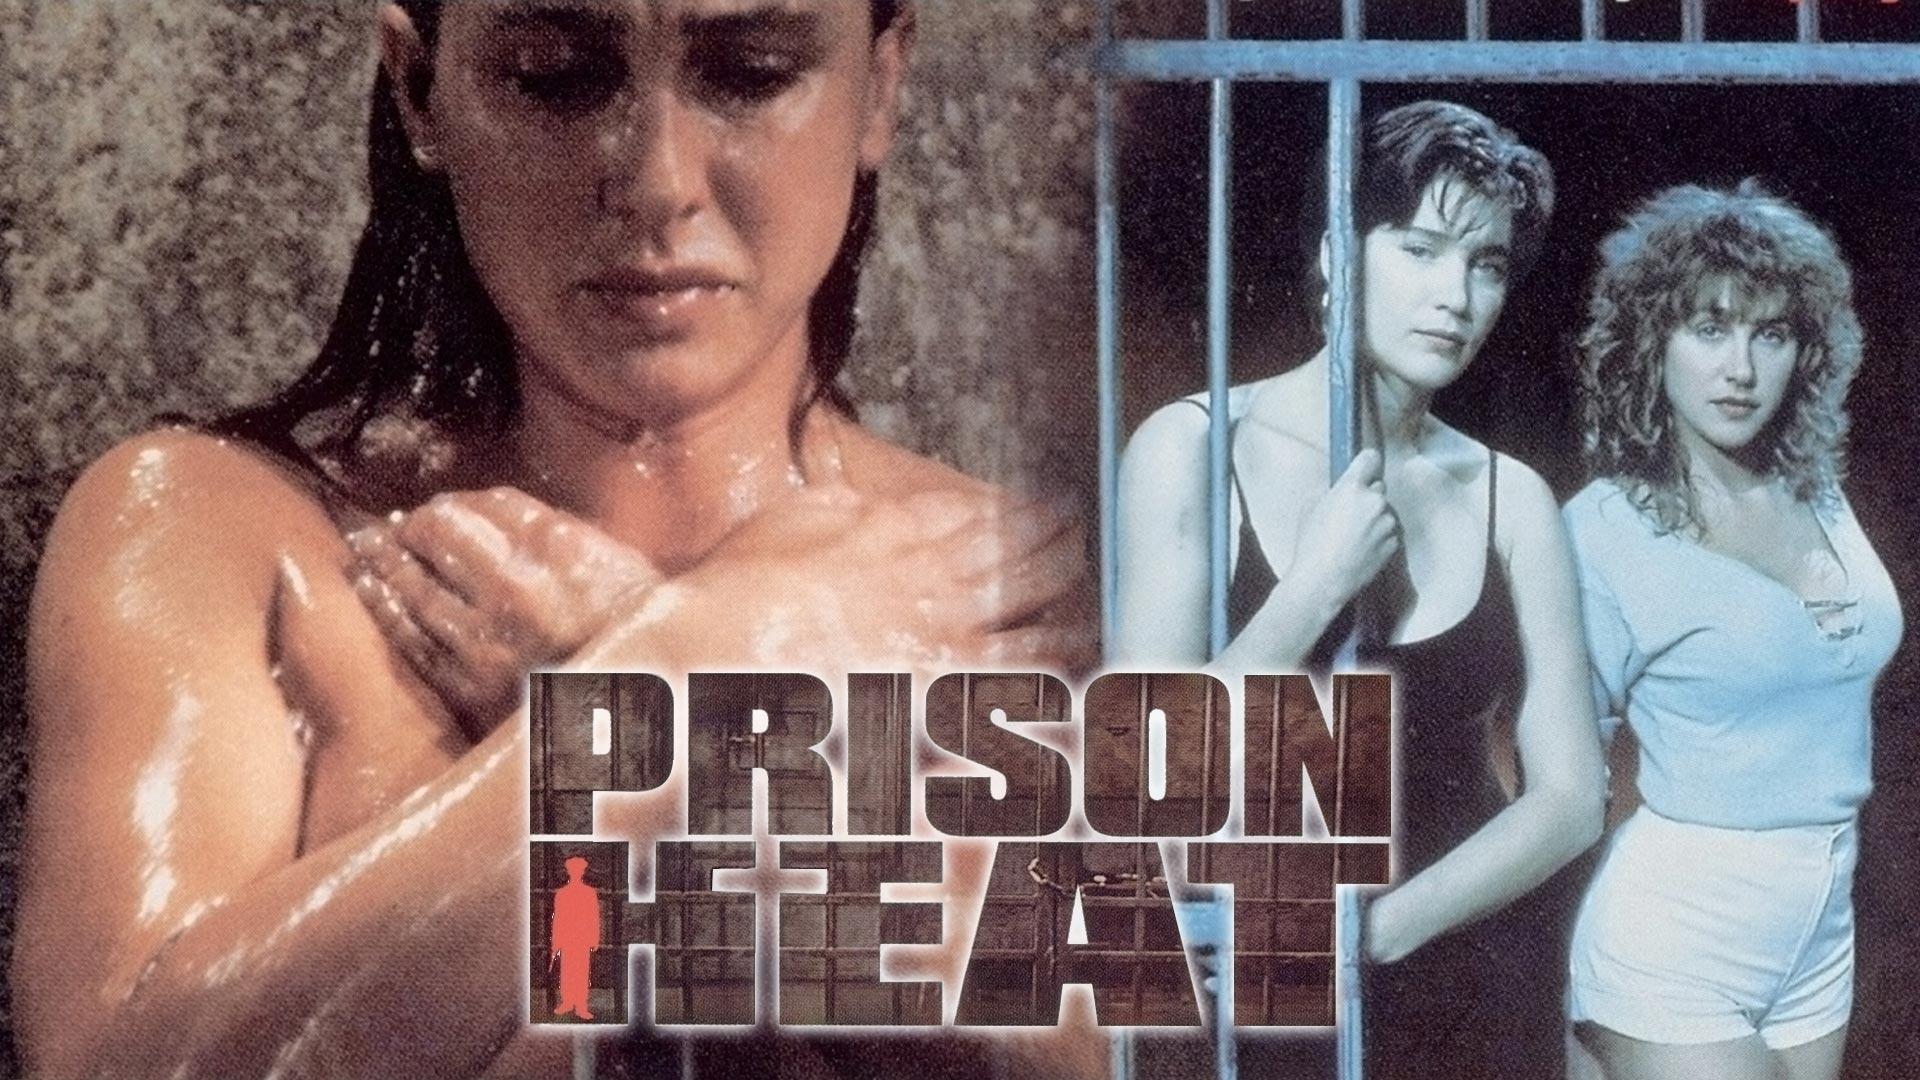 Prison Heat